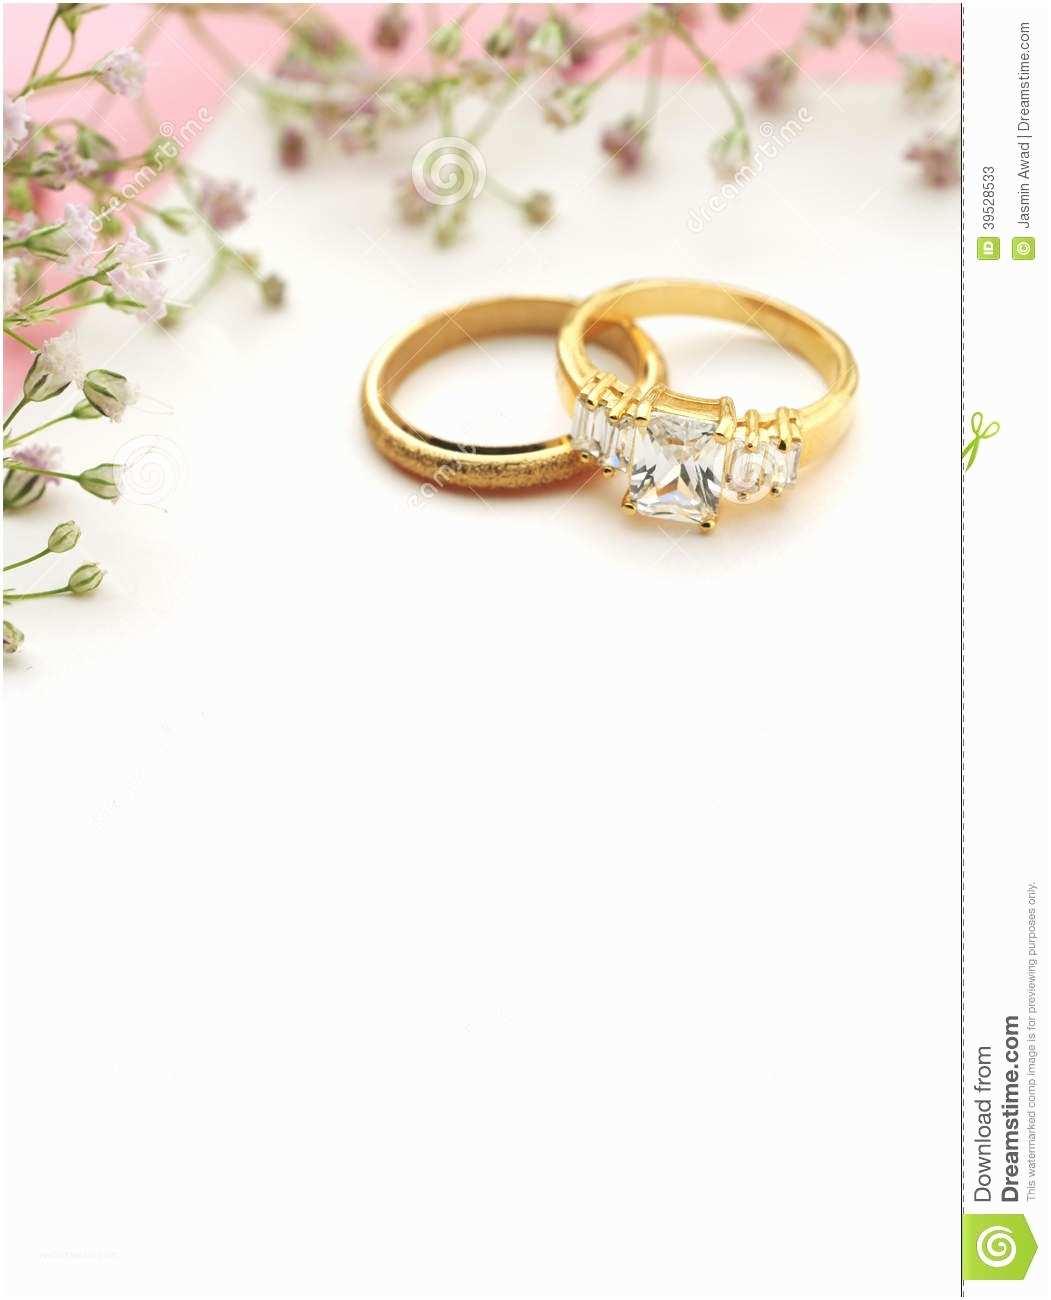 Blank Wedding Invitations Blank Wedding Invitations Blank Wedding Invitations with